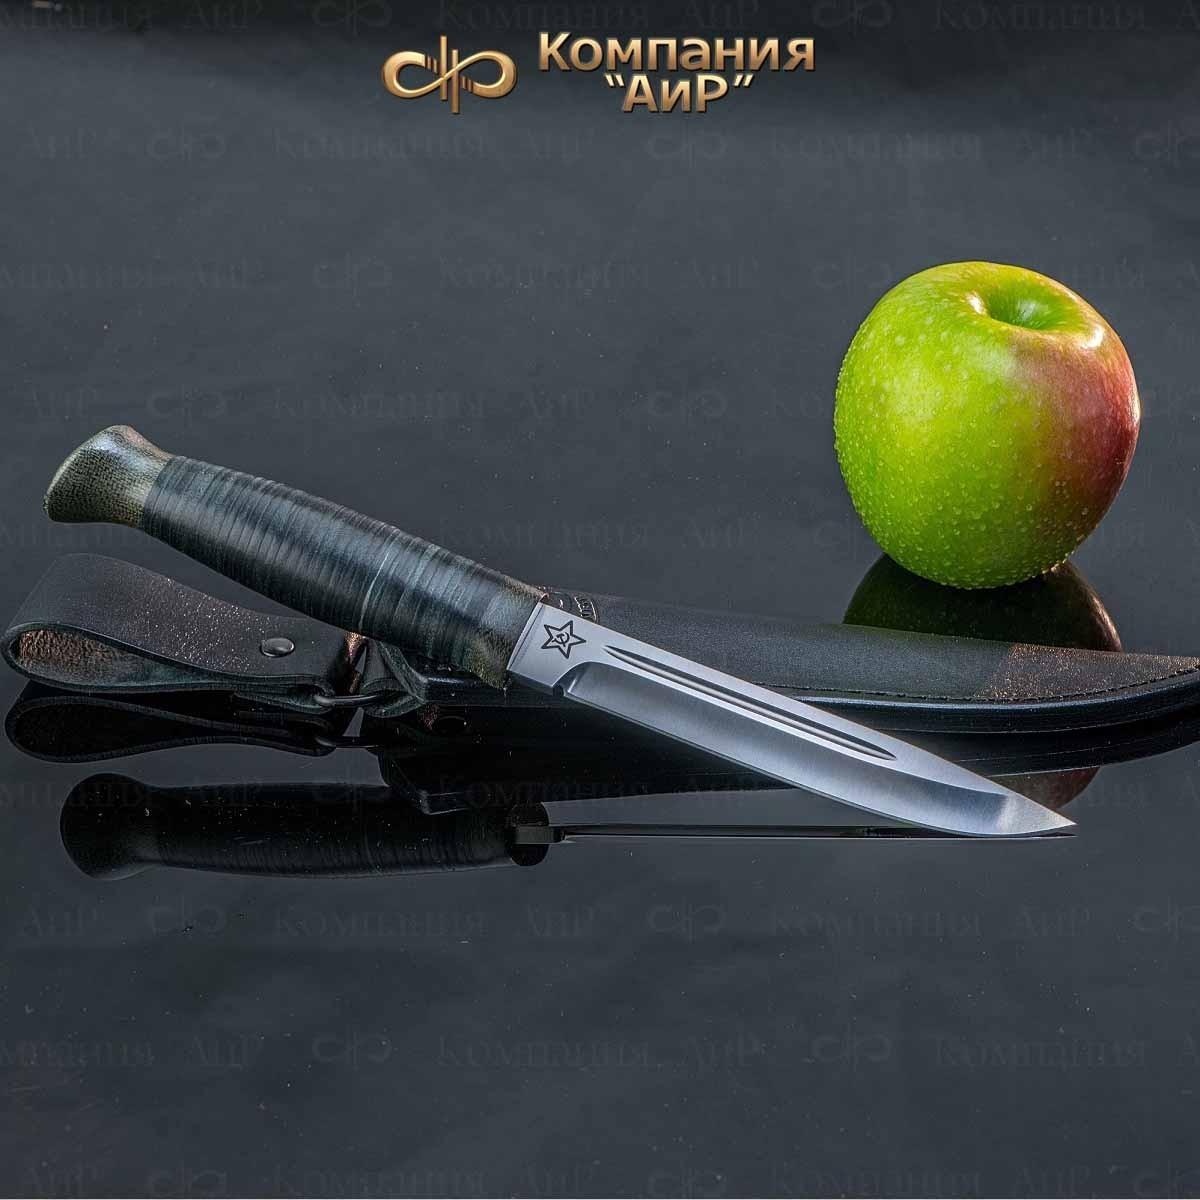 Фото - Нож разделочный АиР Финка-3, сталь 110х18 М-ШД, рукоять кожа нож аир хазар сталь 110х18 м шд рукоять кожа